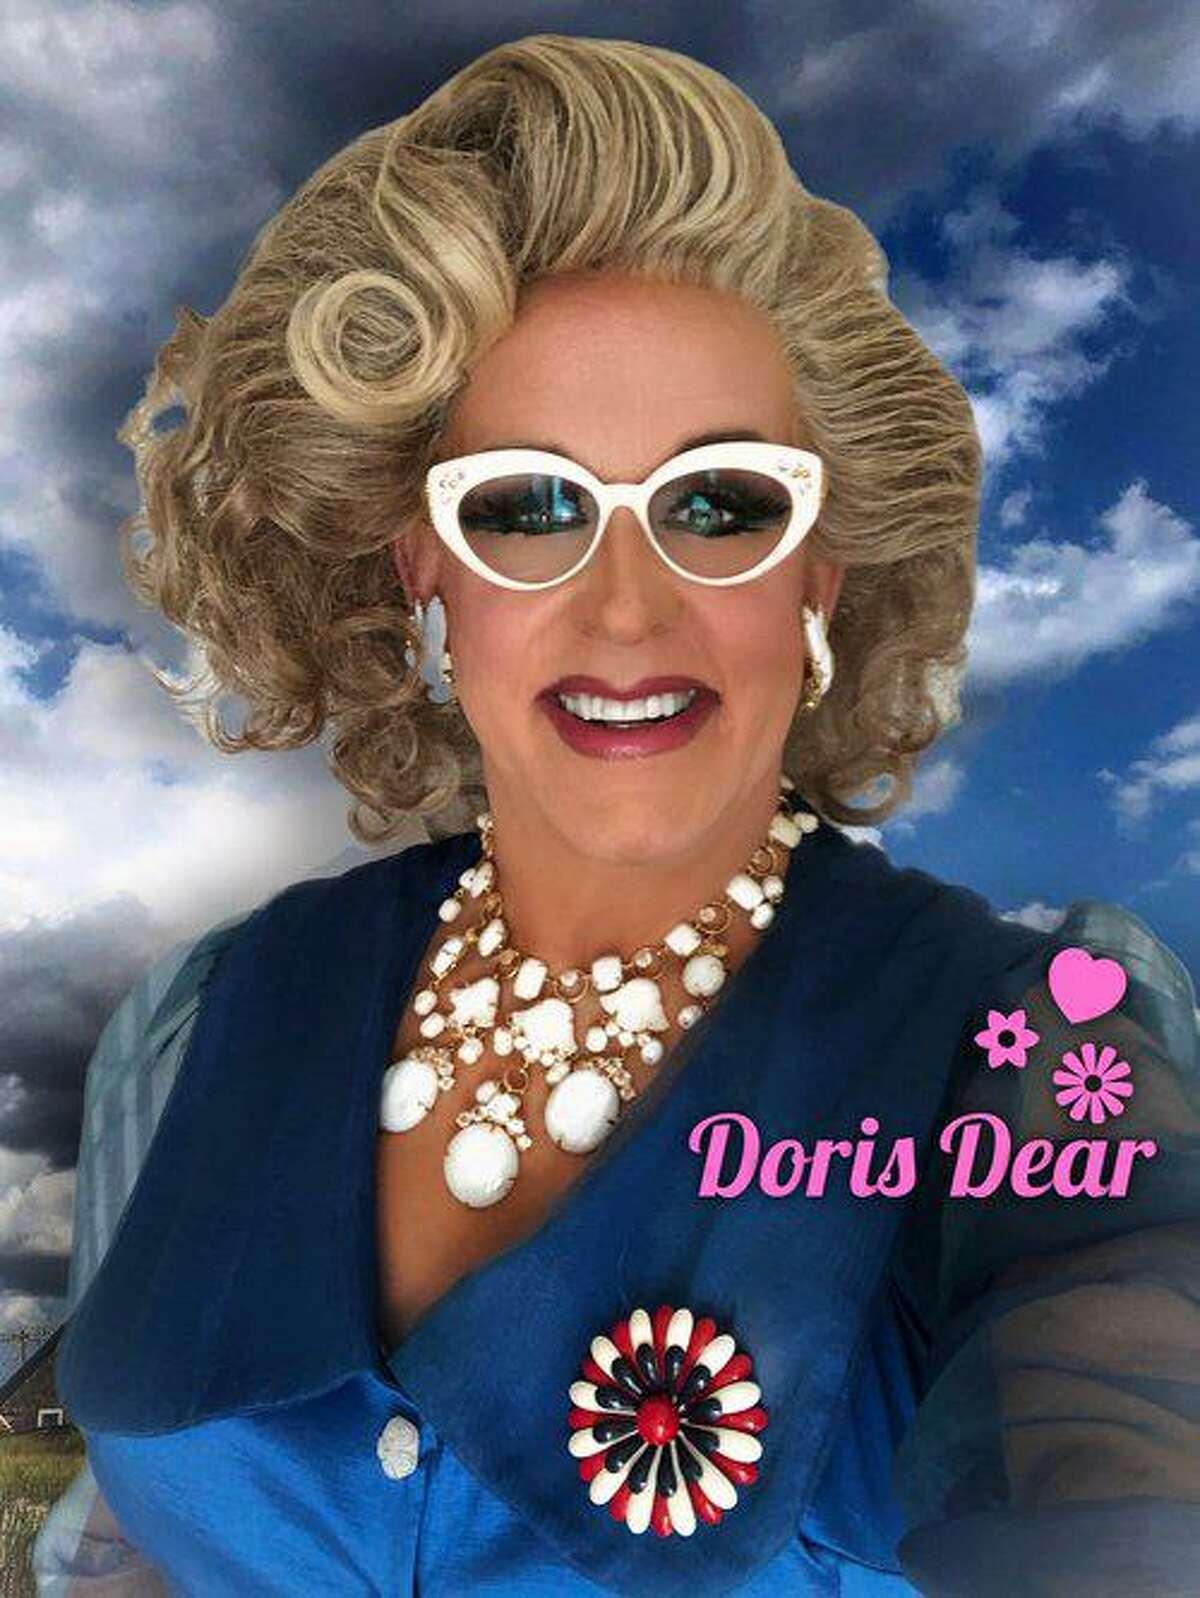 Doris Dear is presenting